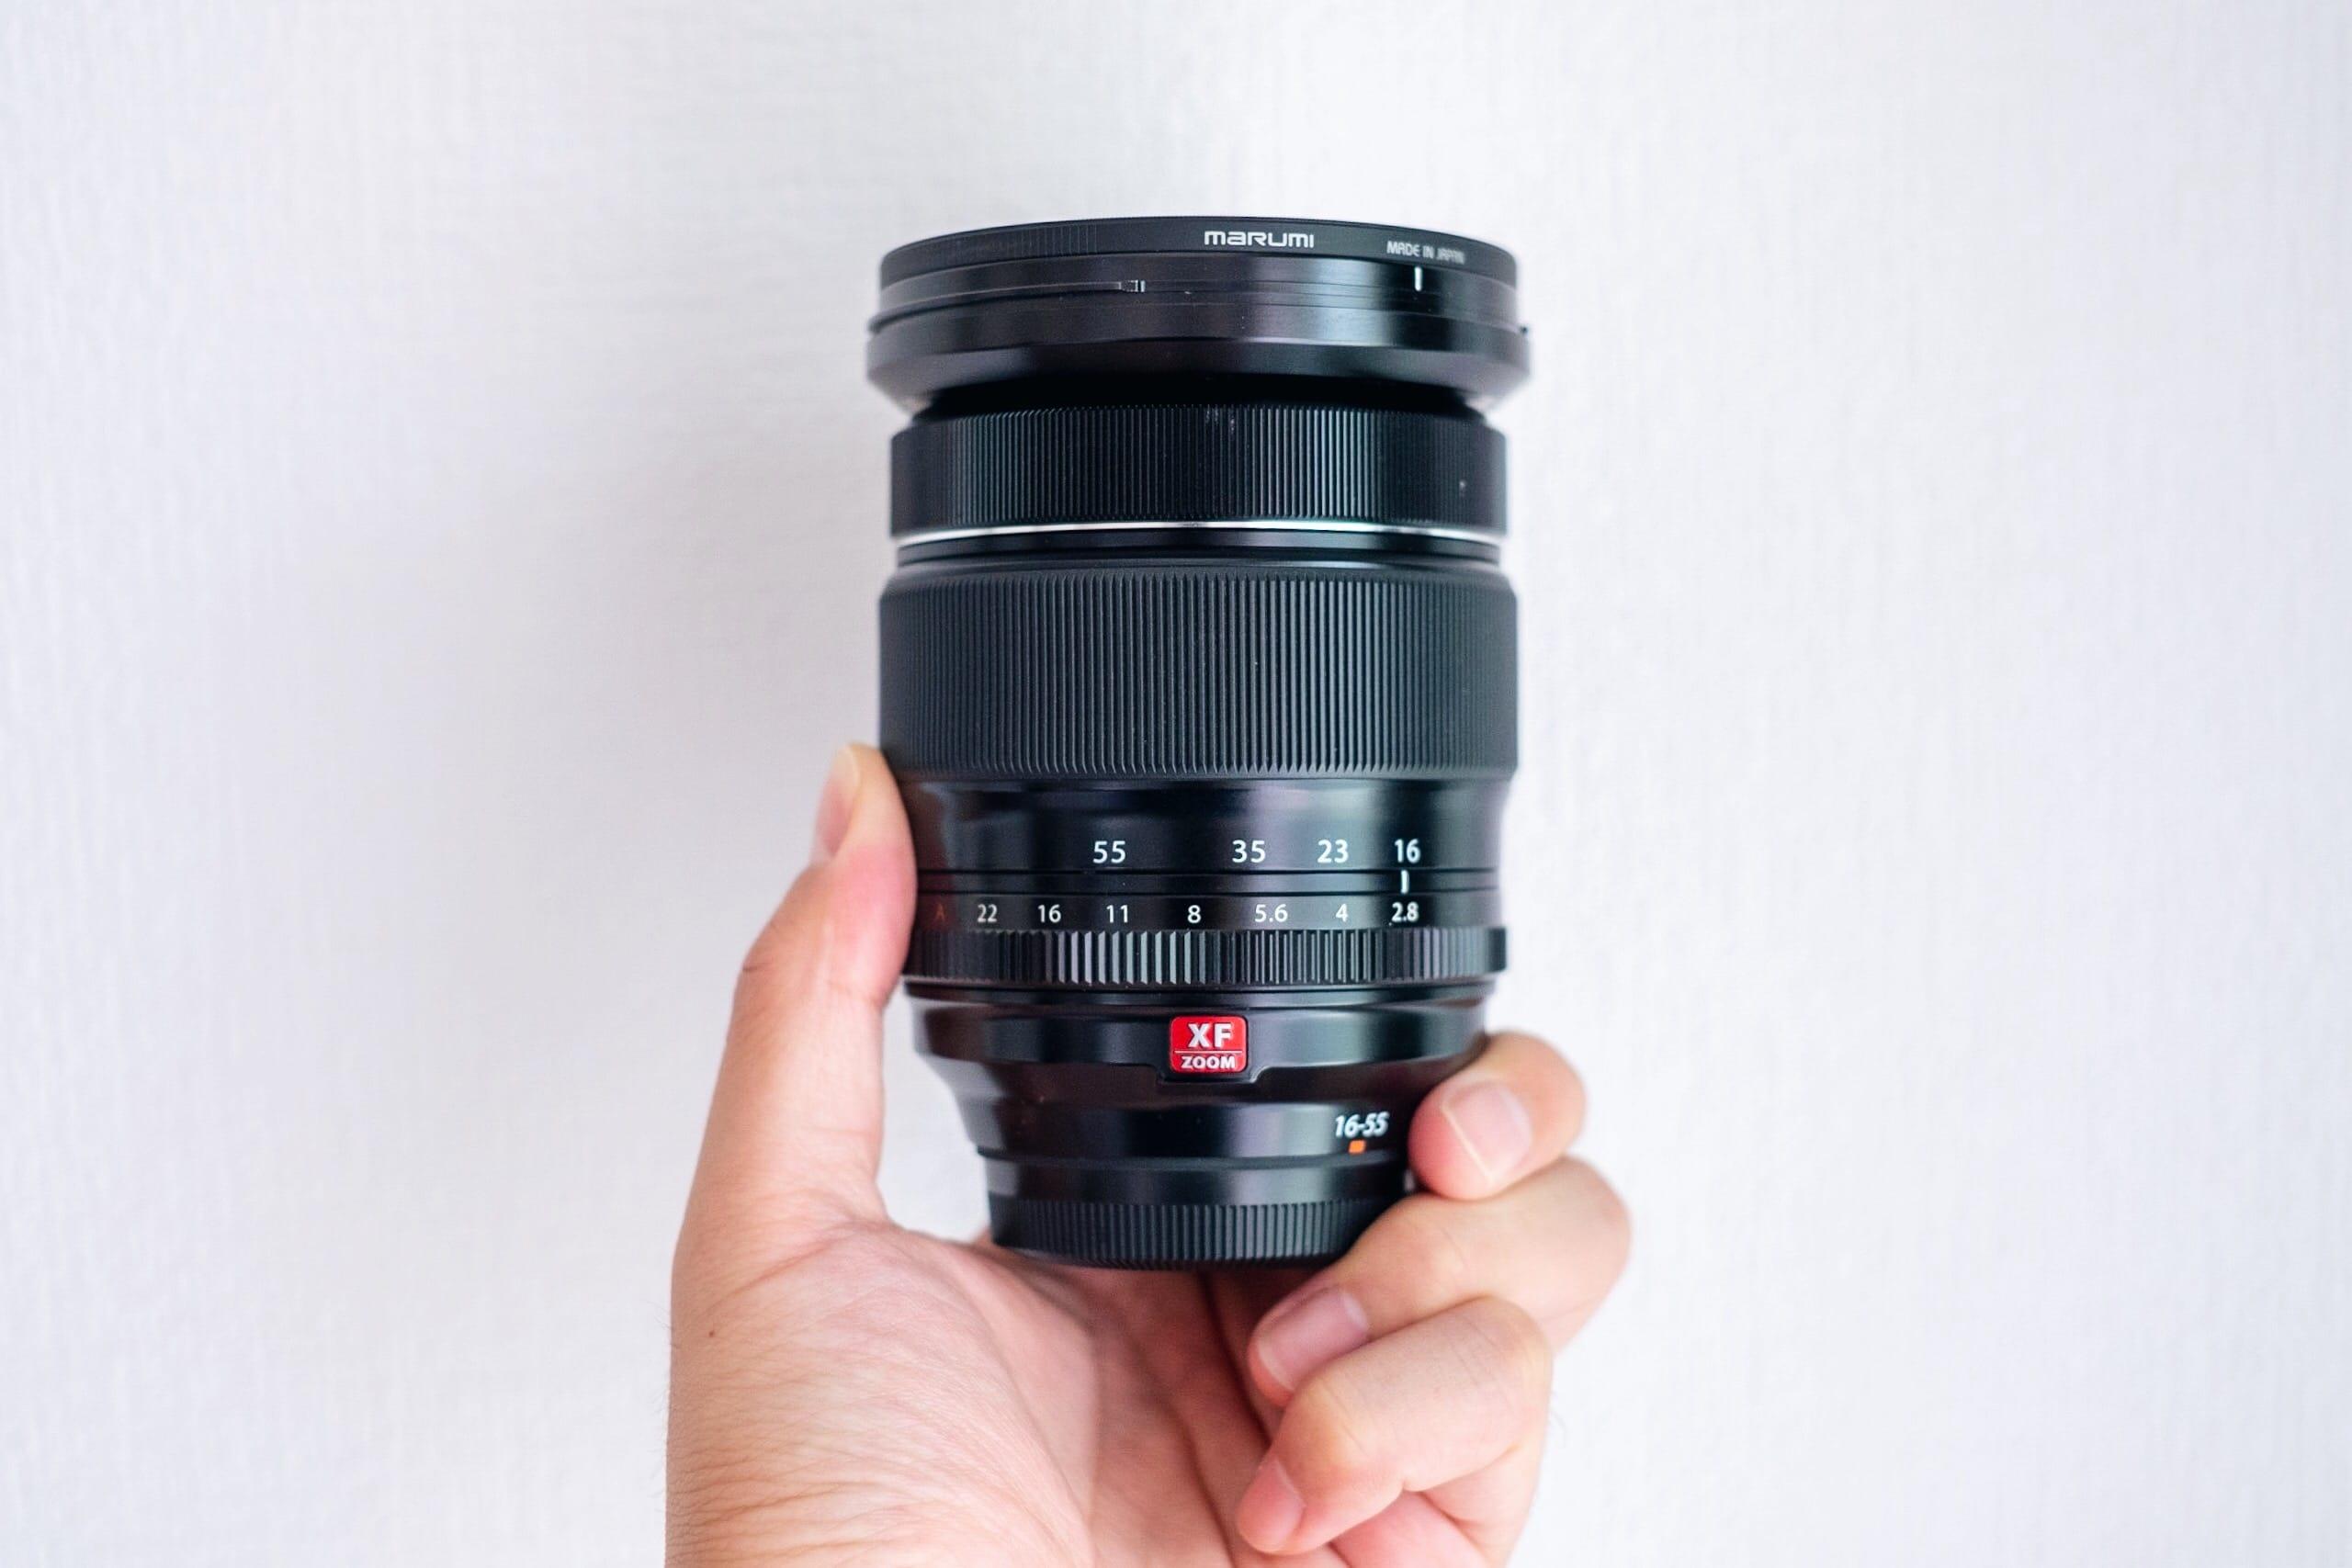 FUJIFILM XF16-55mmF2.8 R LM WR 半年使用レビュー。ズームの利便性と単焦点並みの描写が魅力のレンズ【作例あり】